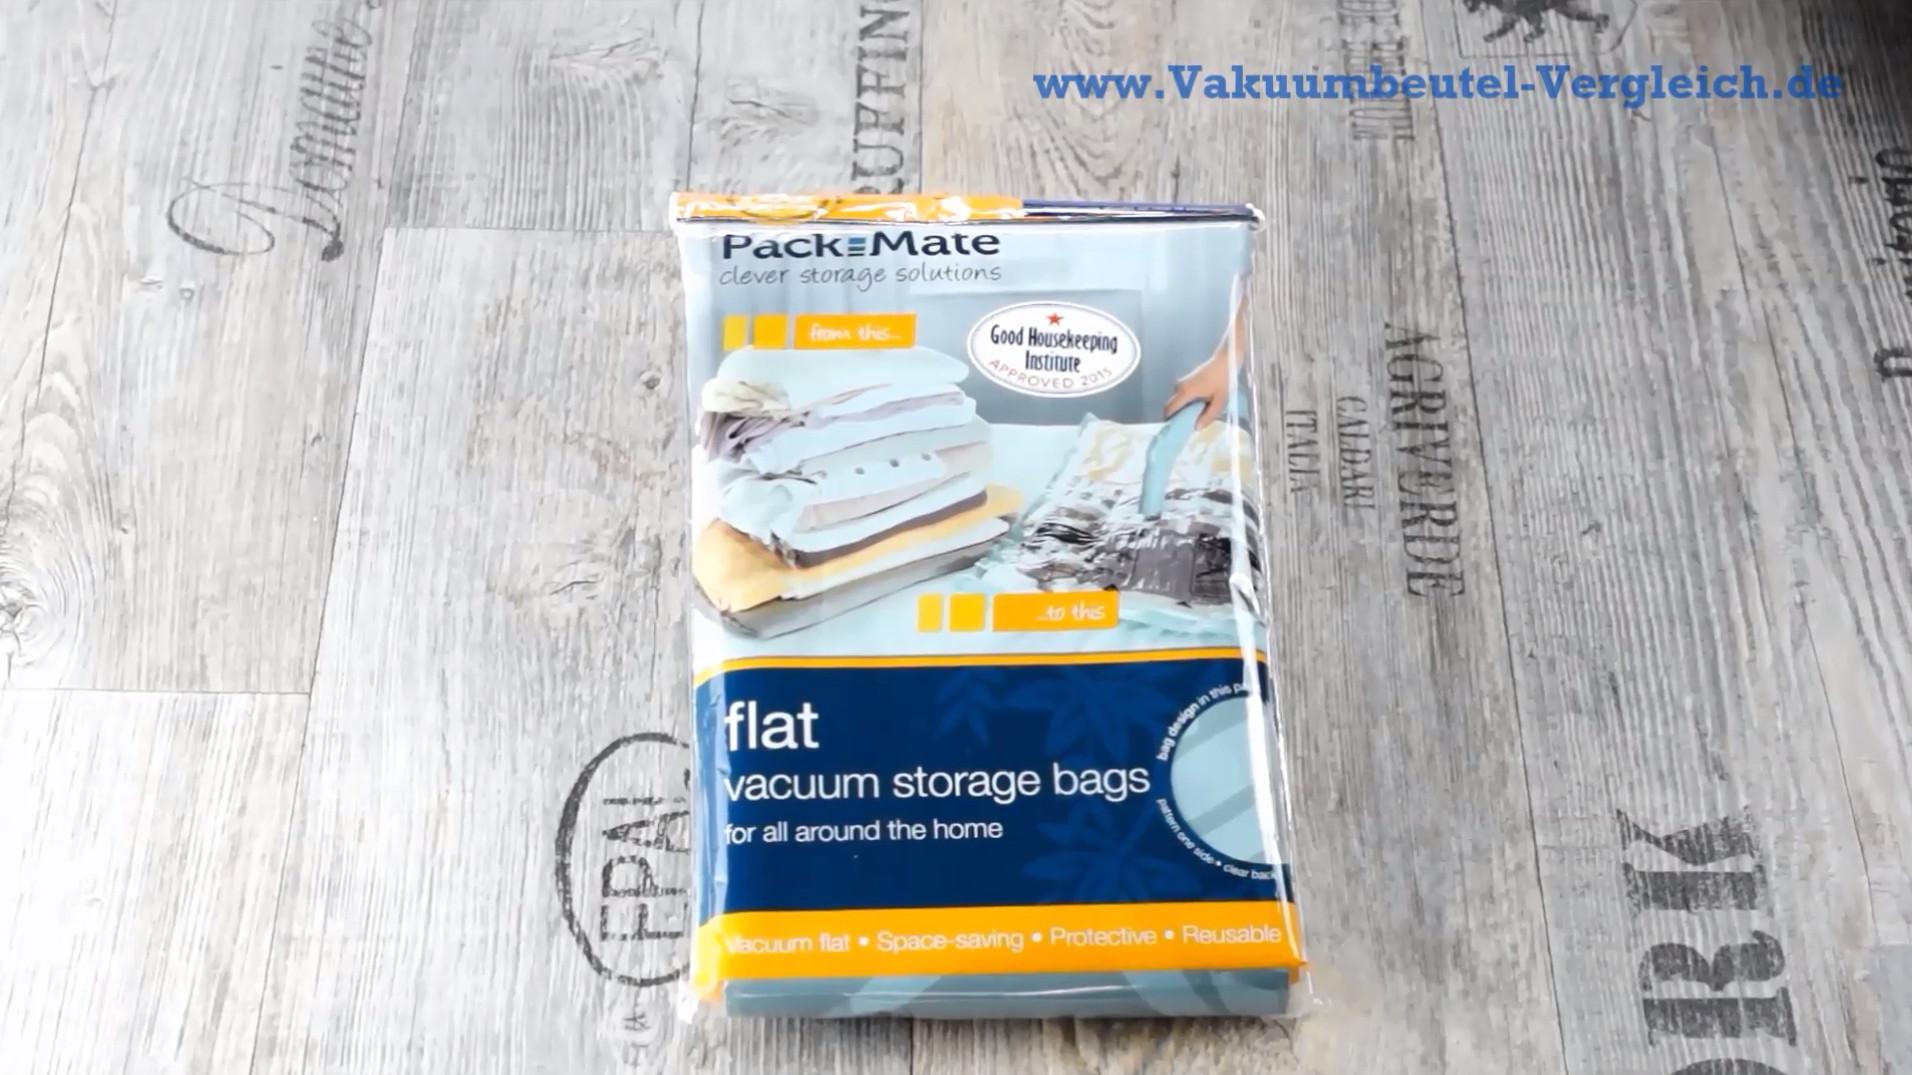 Packmate ® Vakuumbeutel cover